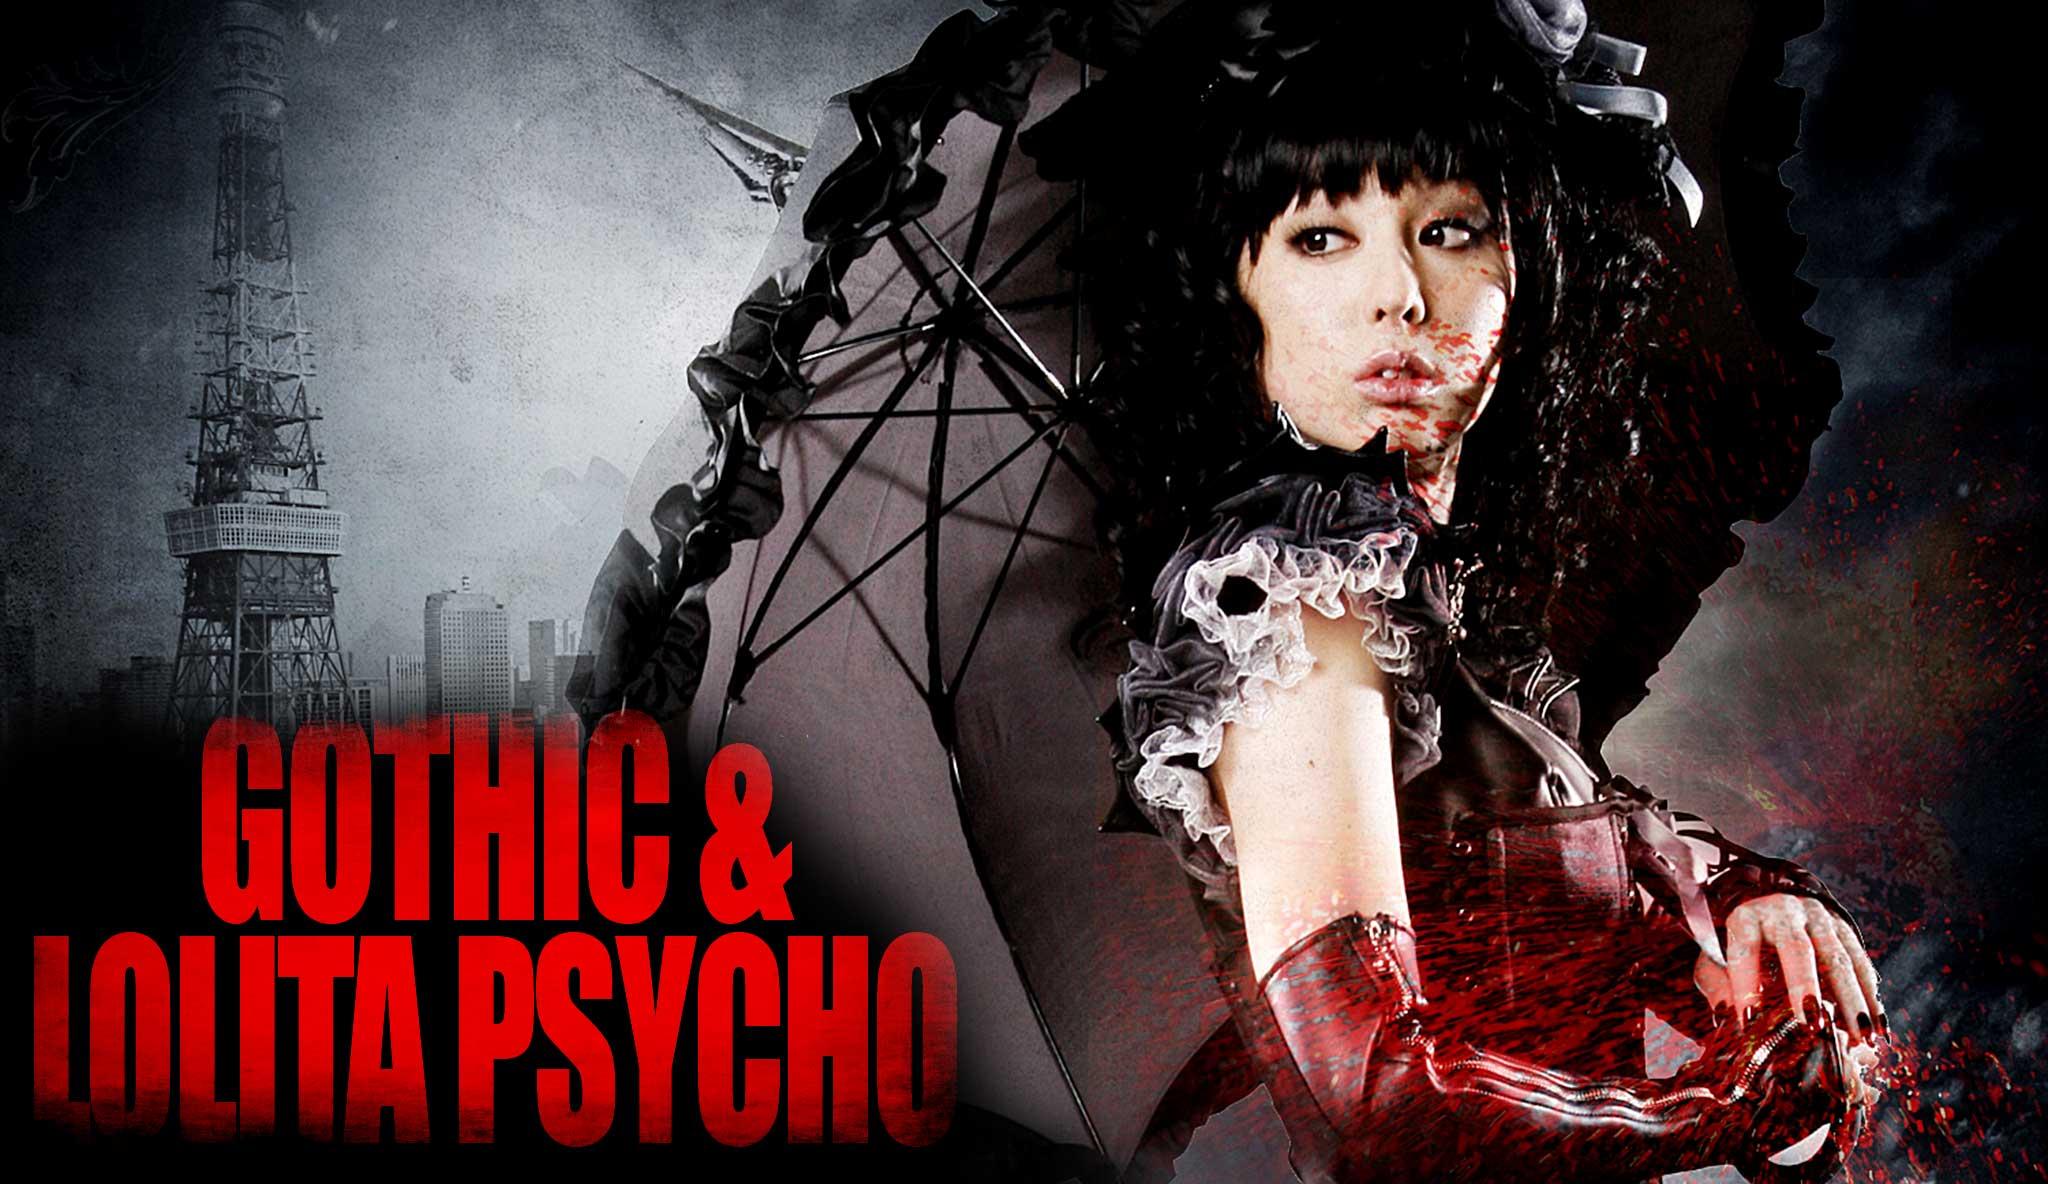 gothic-lolita-psycho\header.jpg